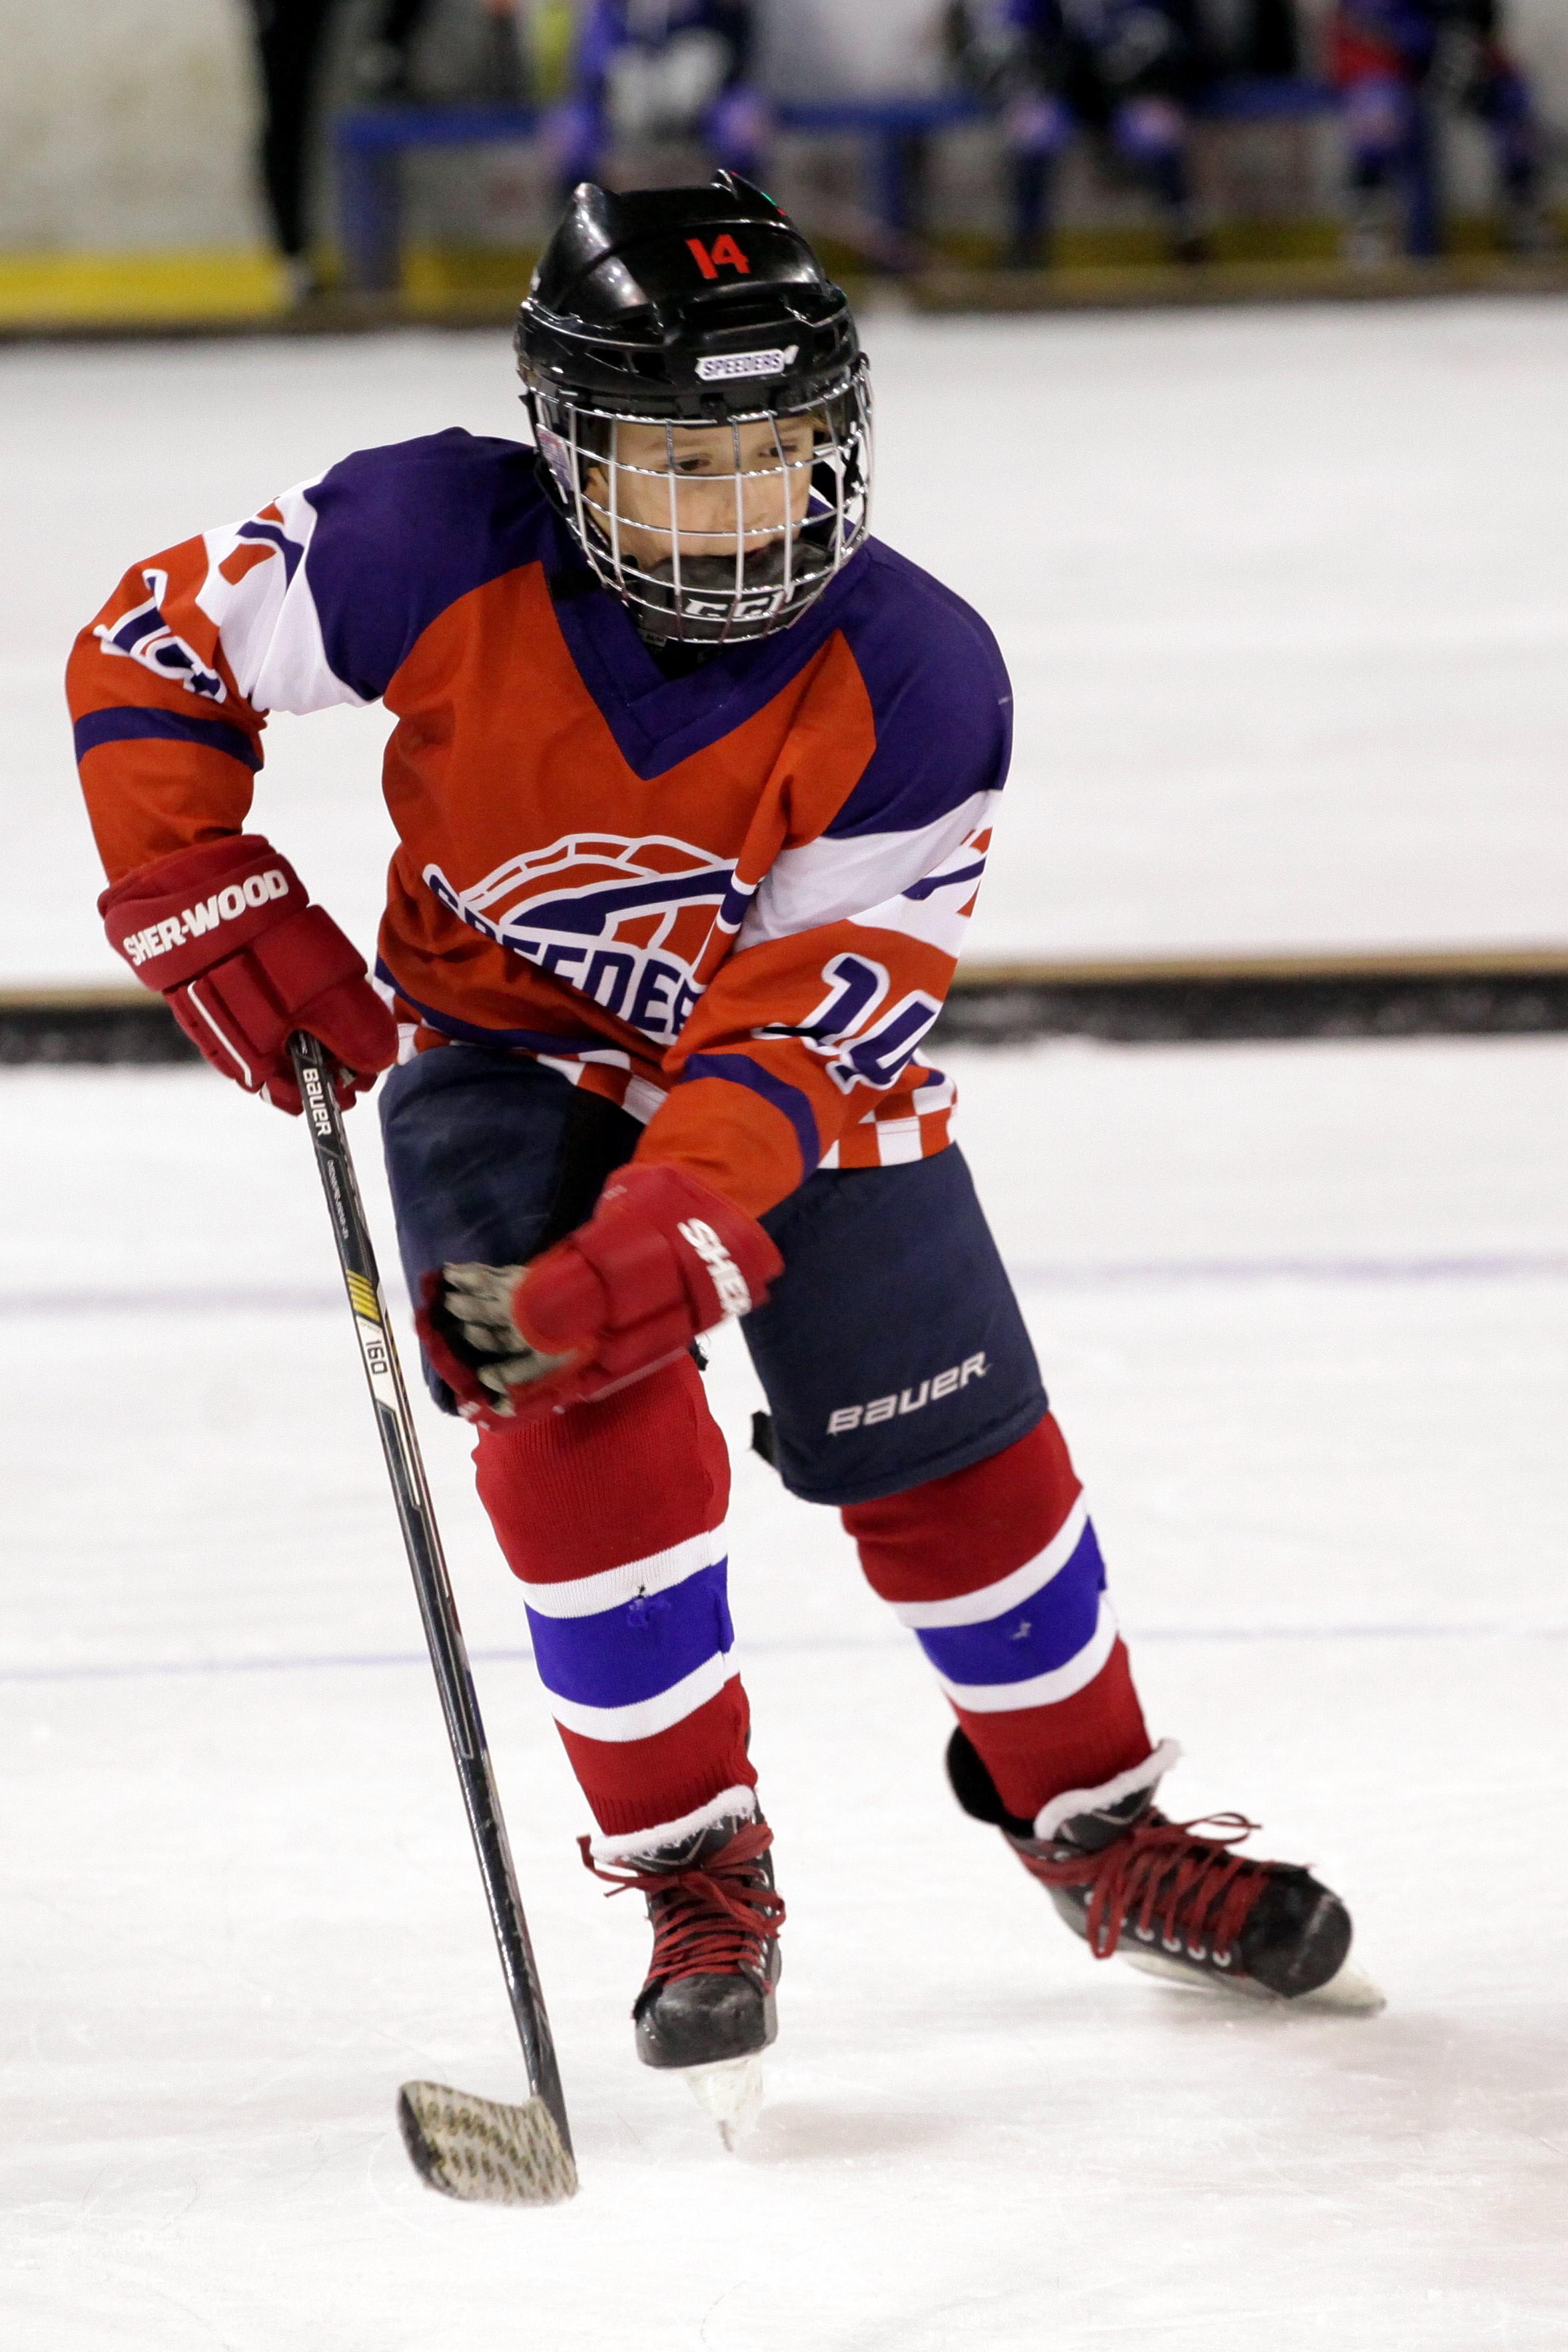 david hruska deti hokej speeders bratislava 4